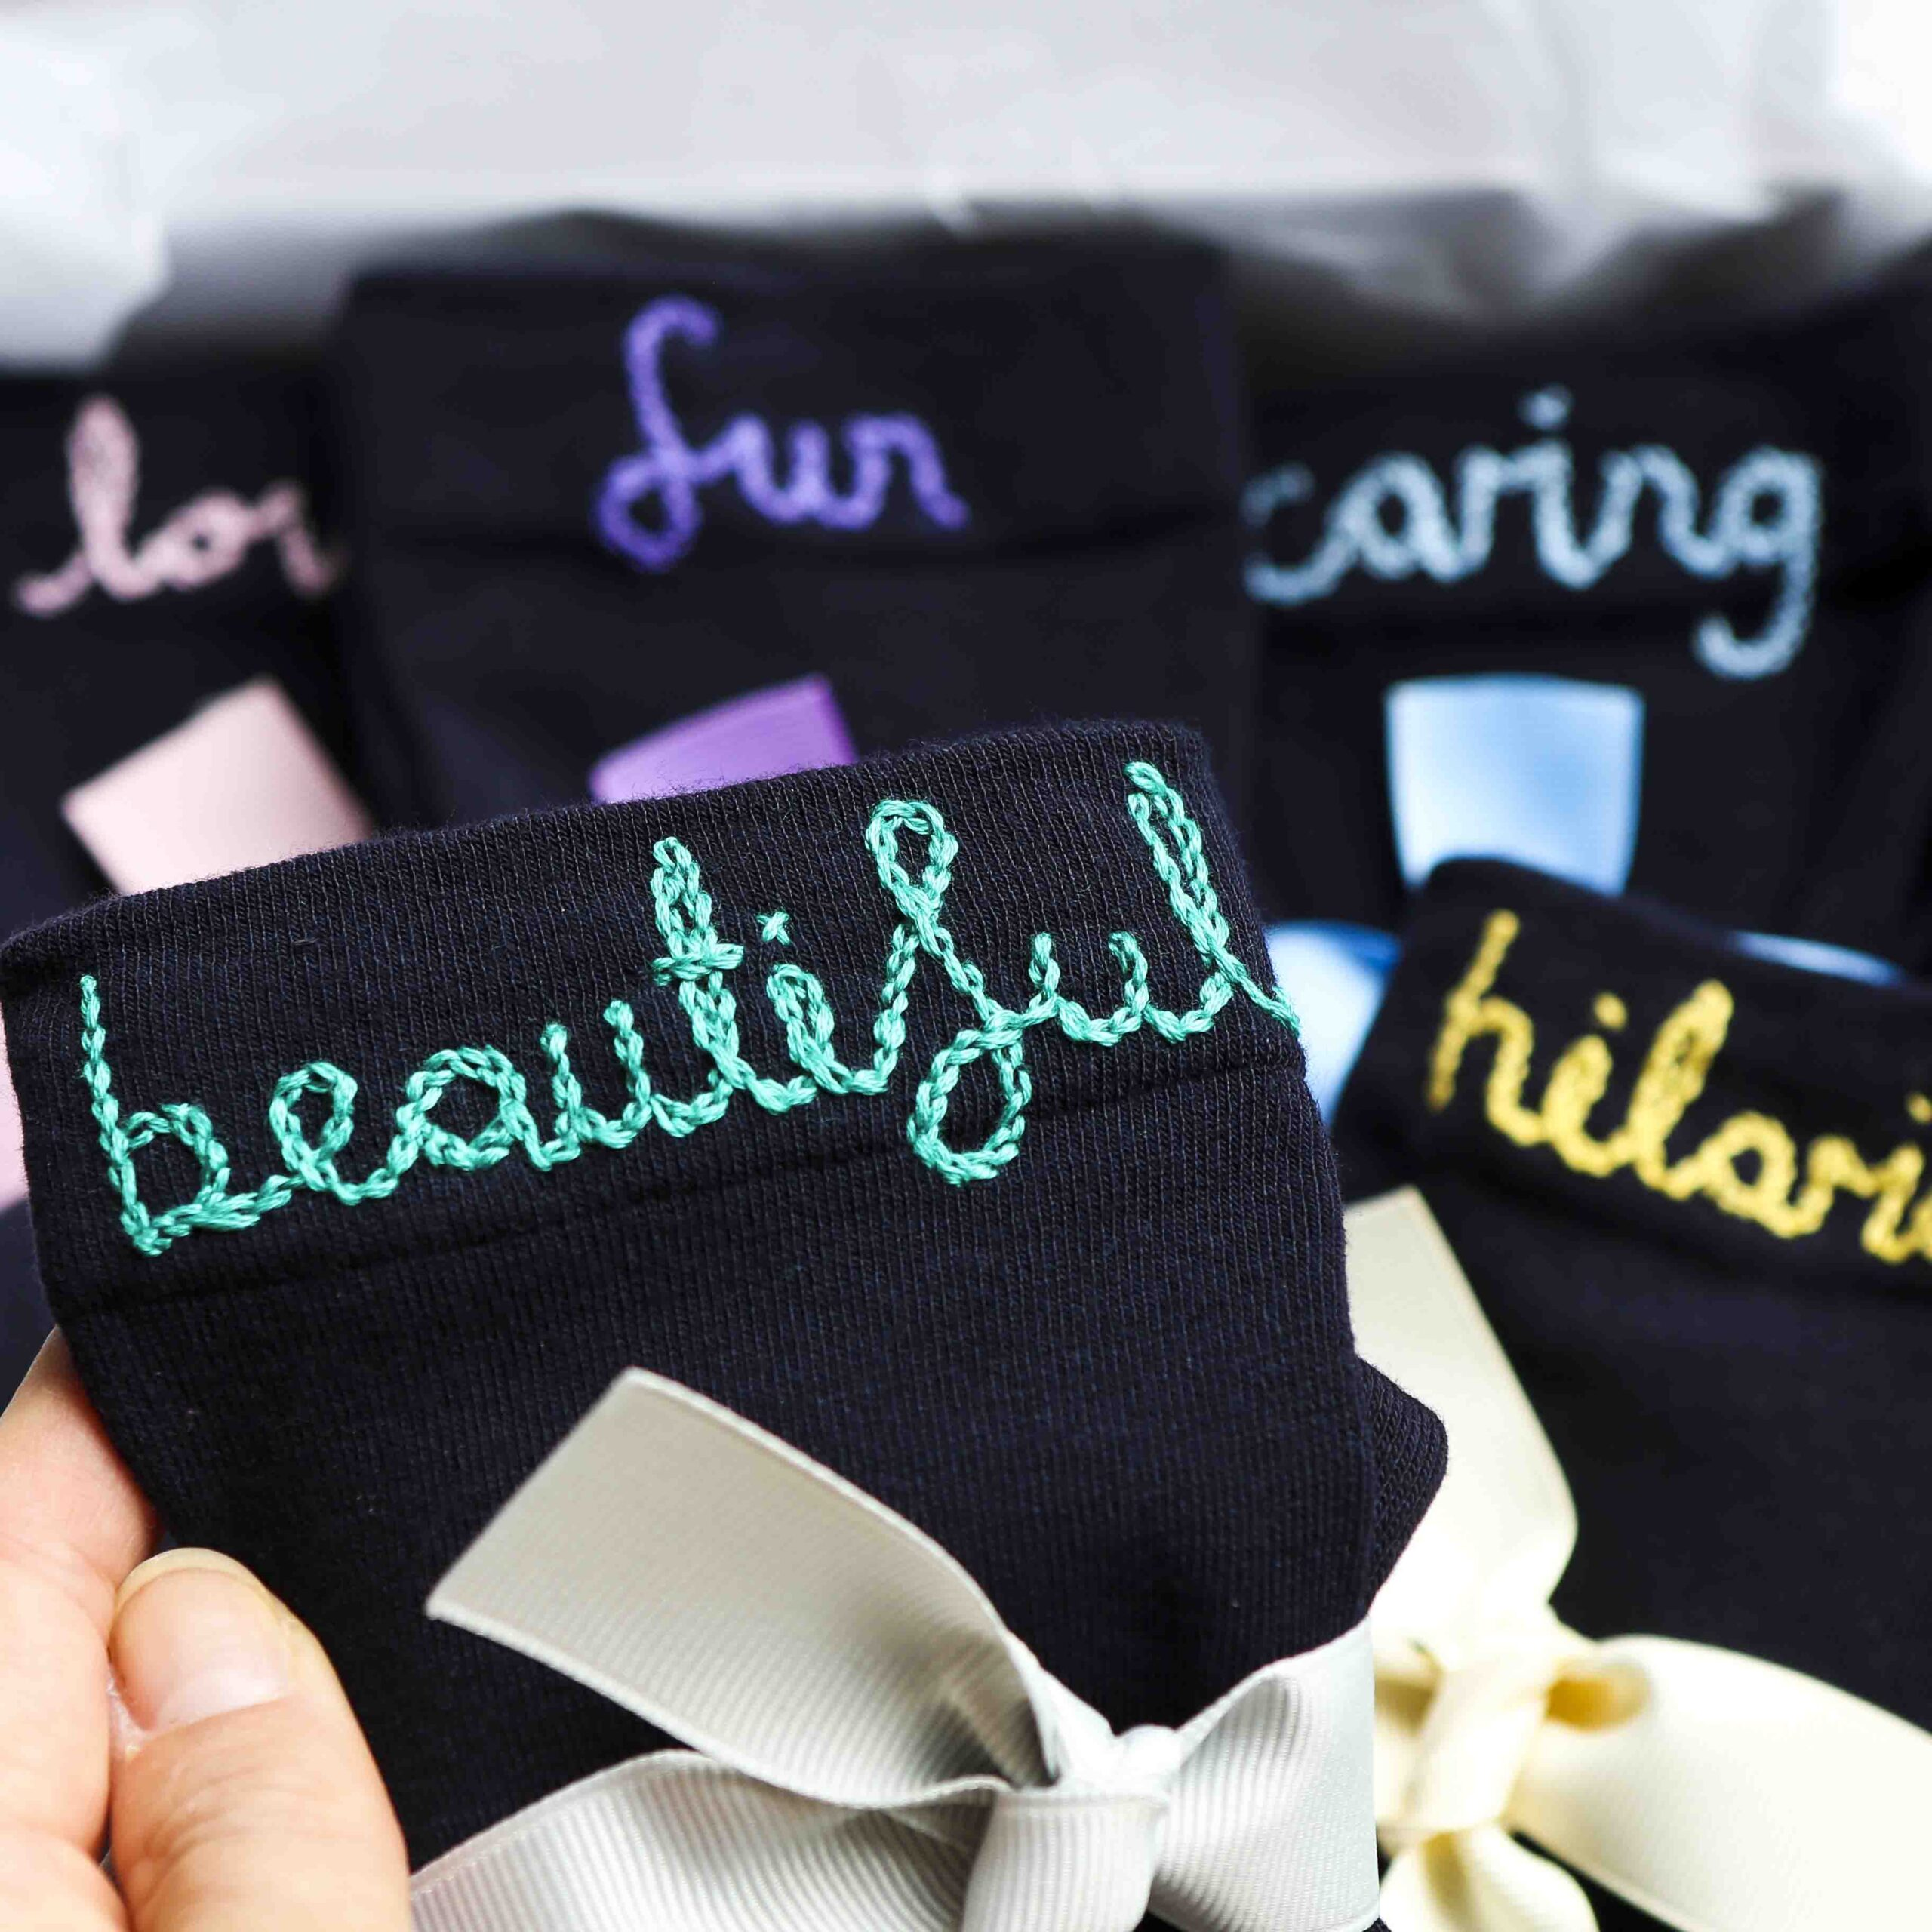 Personalised socks for women StephieAnn